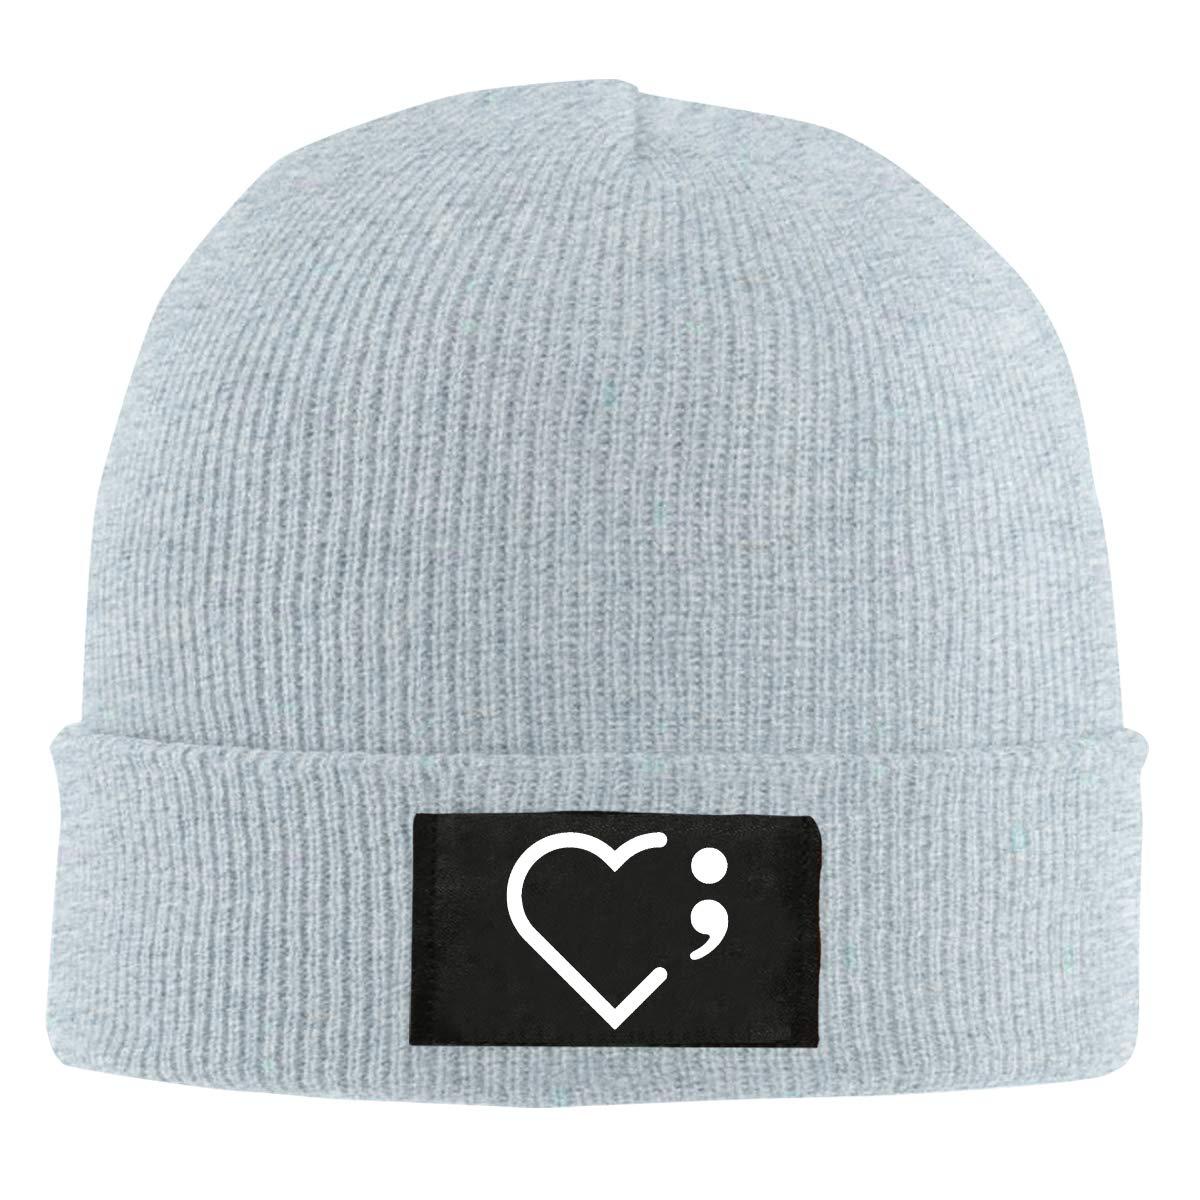 Heart Semicolon Suicide Prevention Awareness Unisex Warm Winter Hat Knit Beanie Skull Cap Cuff Beanie Hat Winter Hats